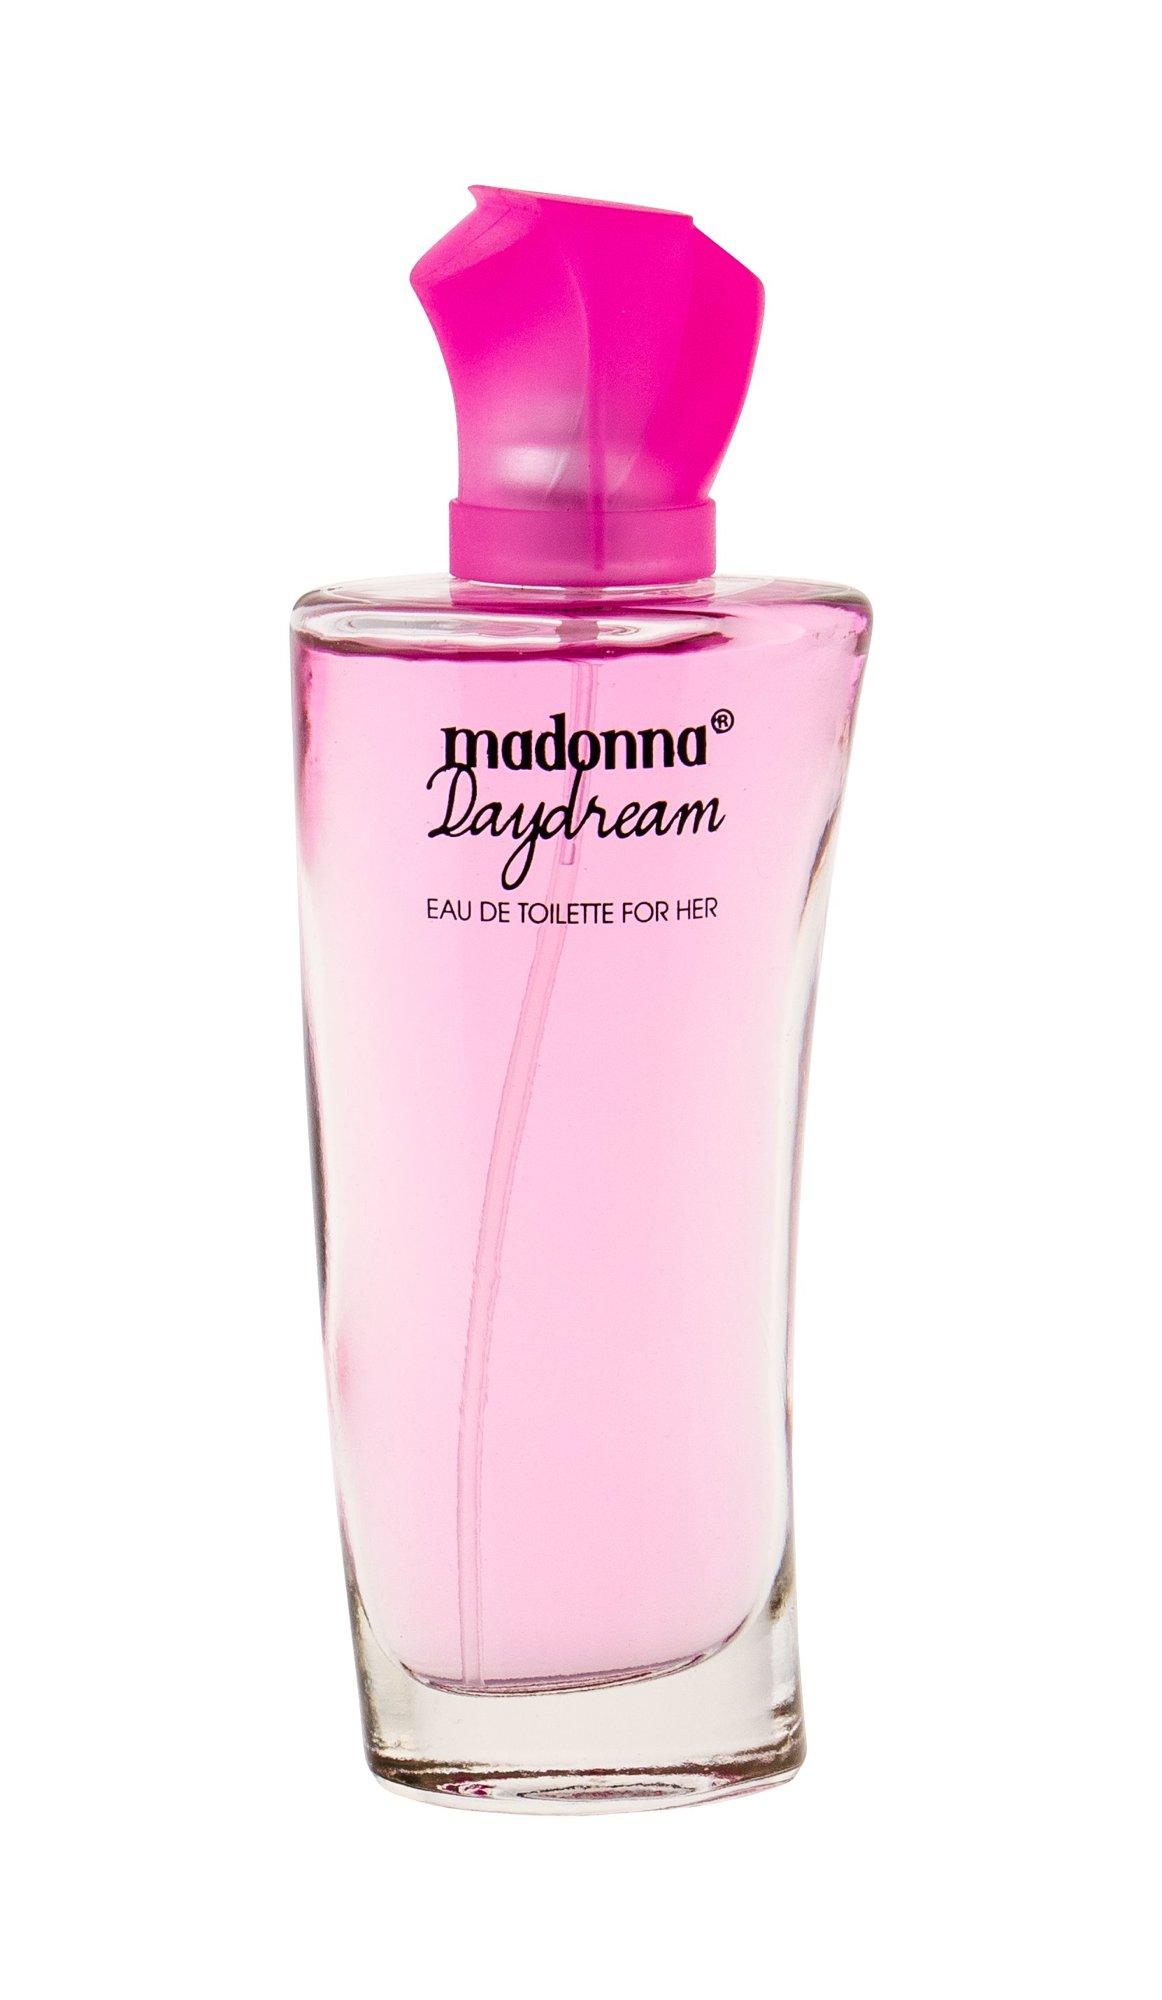 Madonna Nudes 1979 Daydream Eau de Toilette 50ml